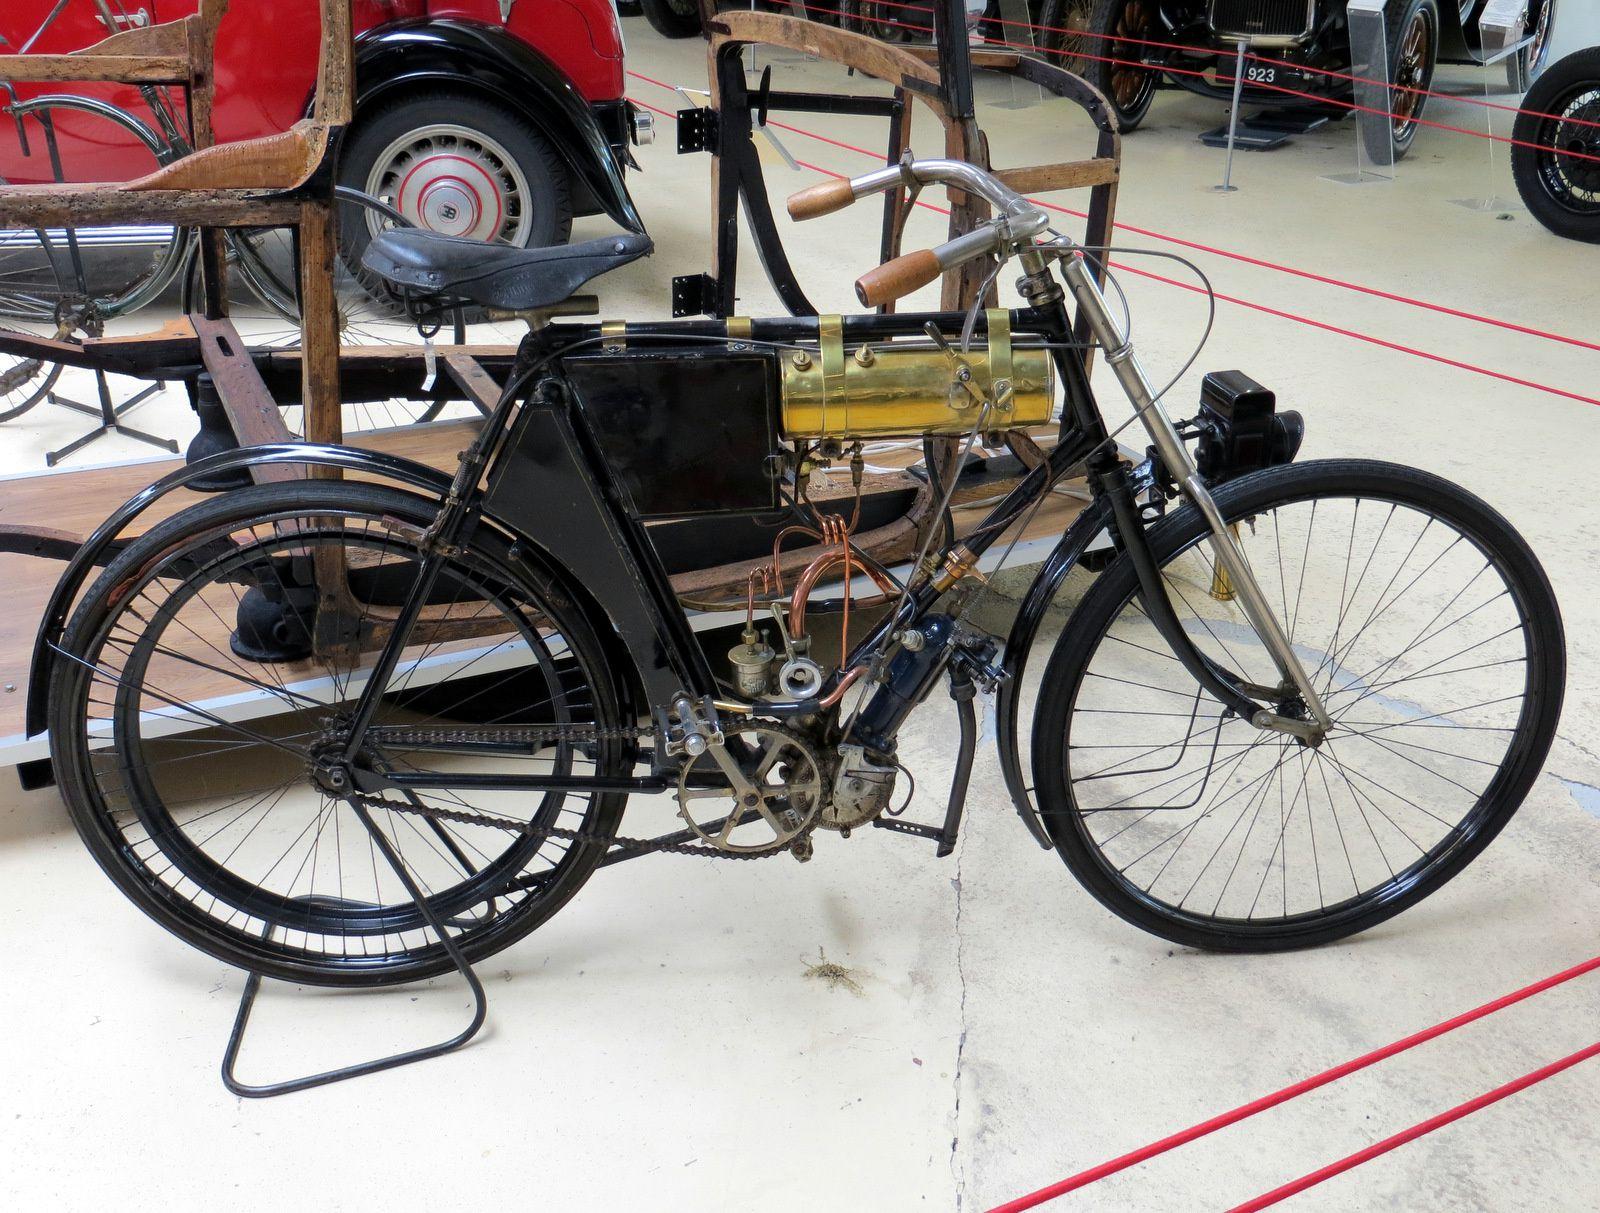 Bicyclette motorisée (1904), Herdtlé-Bruneau